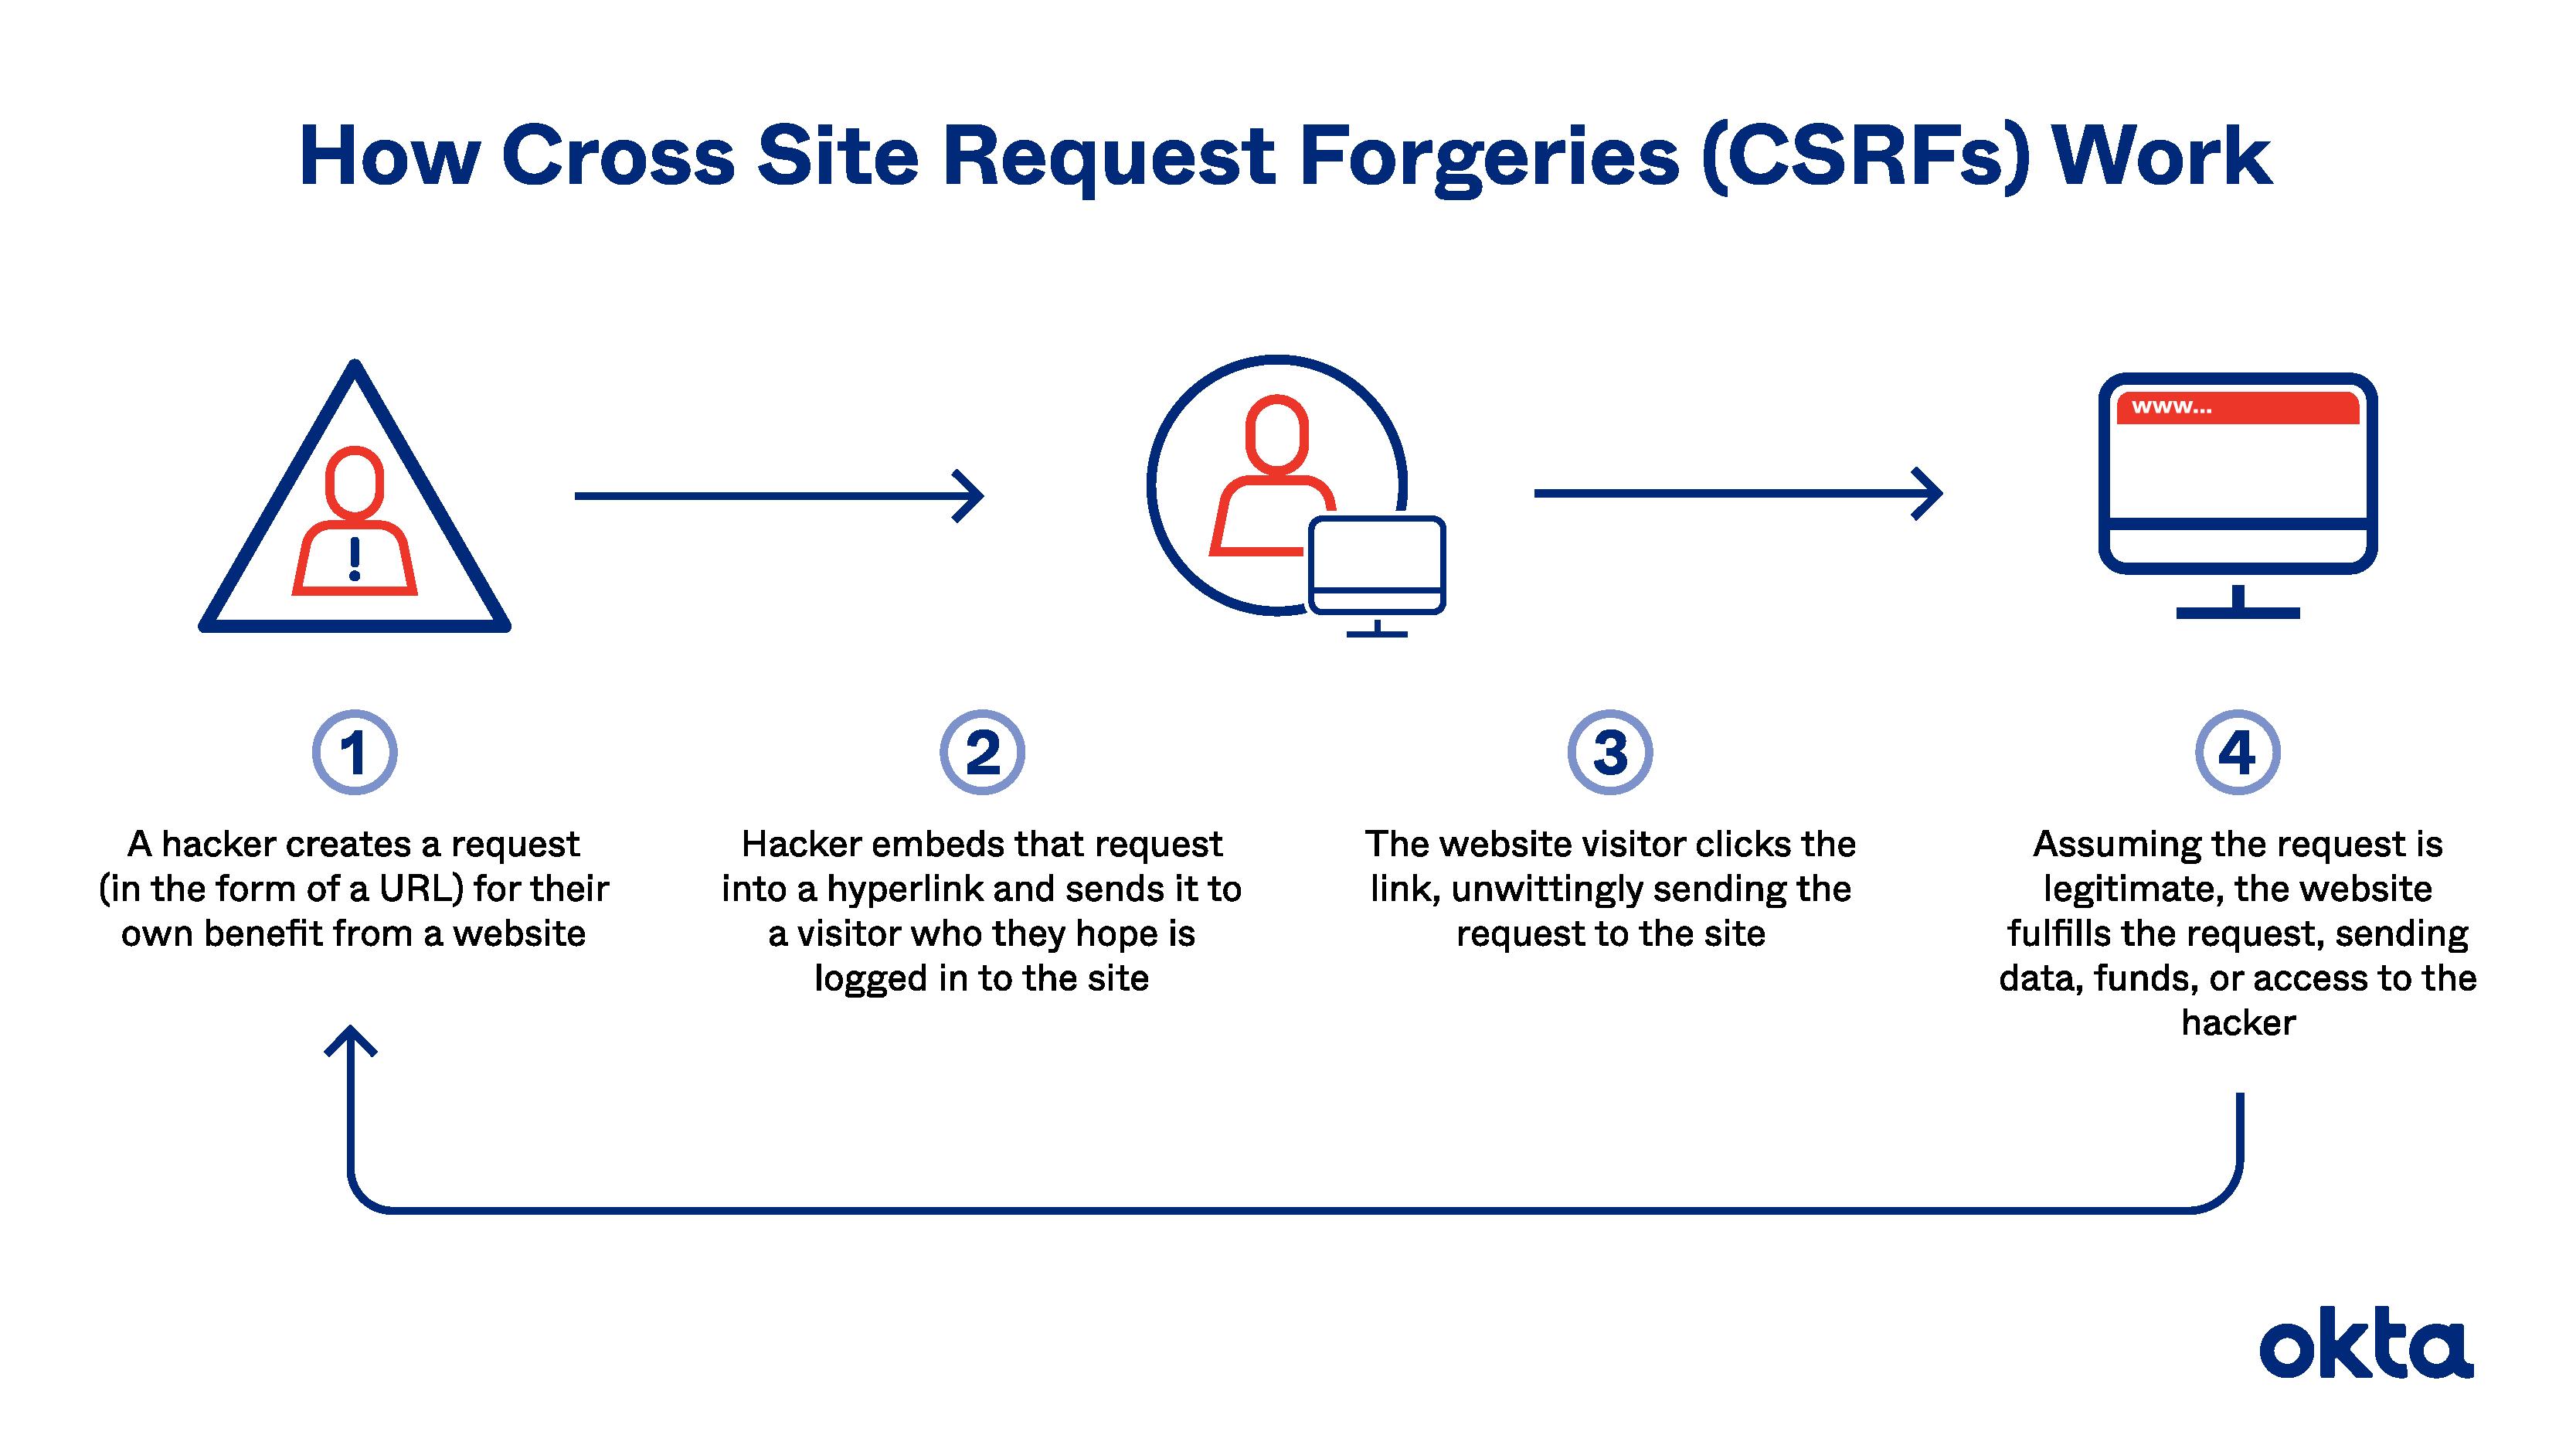 How Do CSRF Attacks Work?